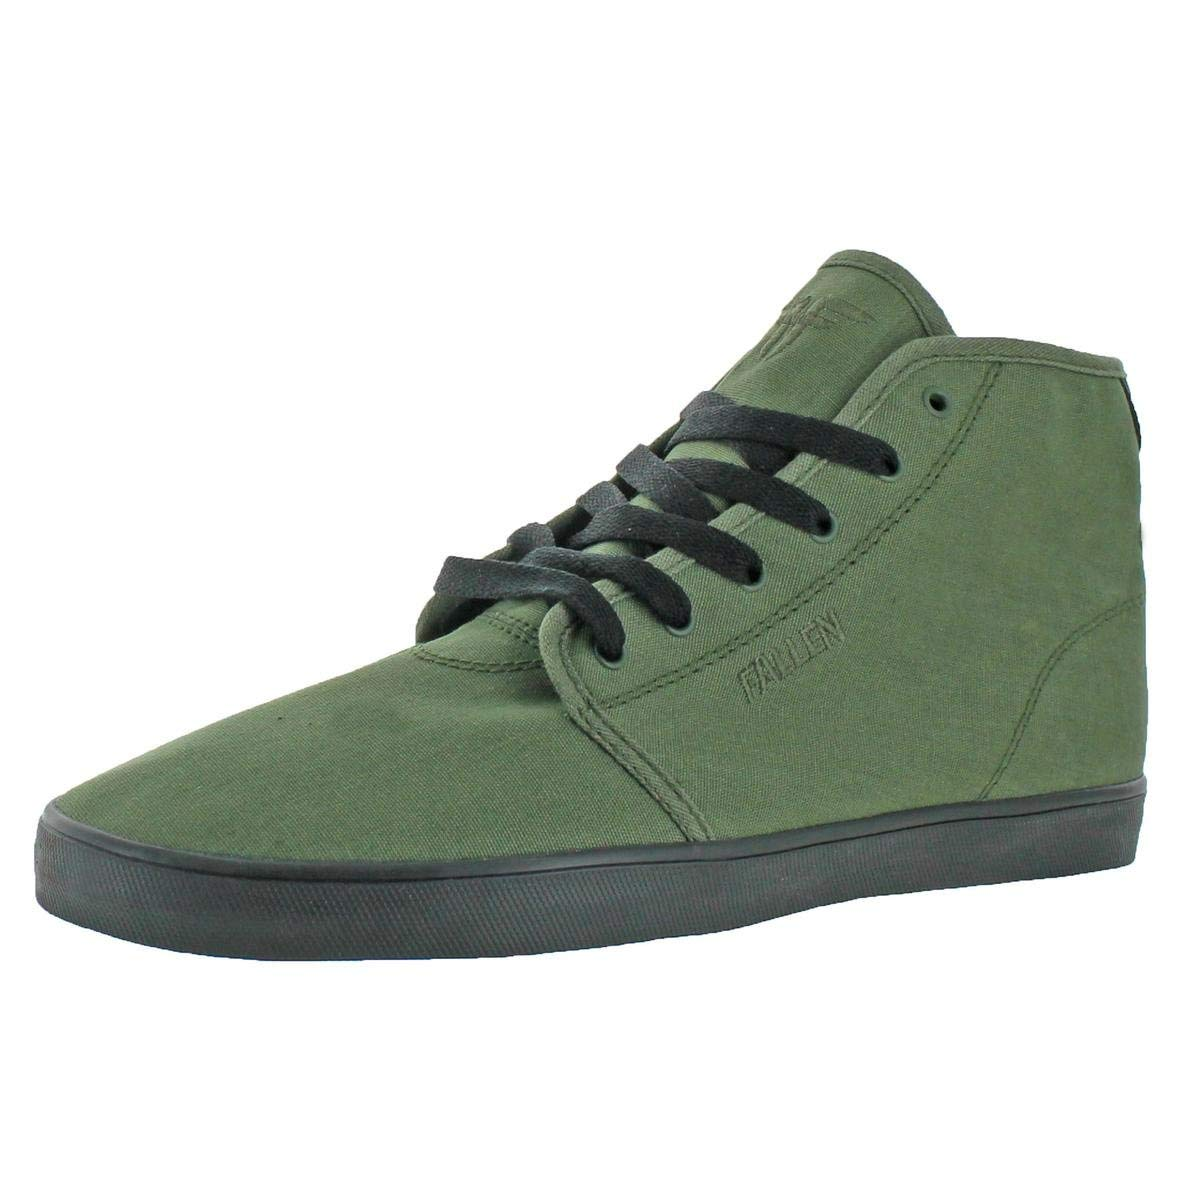 3775ffd4151ec Cheap Fallen Skate Shoes, find Fallen Skate Shoes deals on line at ...